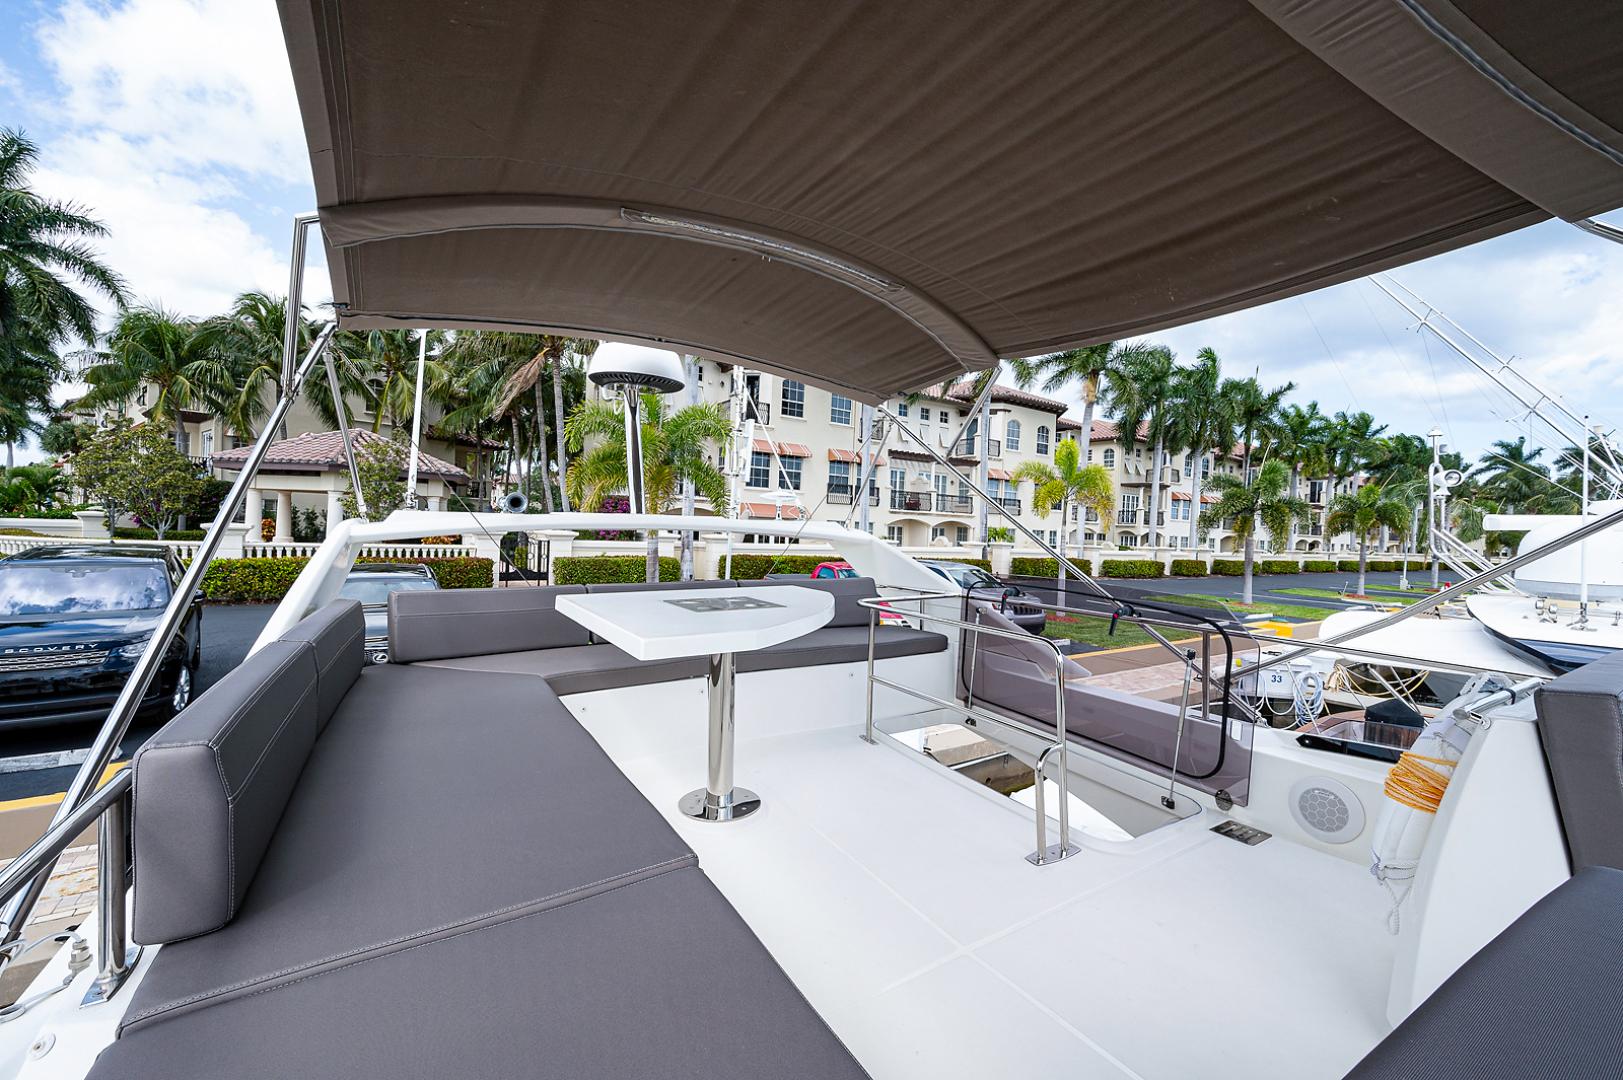 Prestige-460 Flybridge 2018-SEAQUEL Palm Beach Gardens-Florida-United States-Flybridge-1351144 | Thumbnail